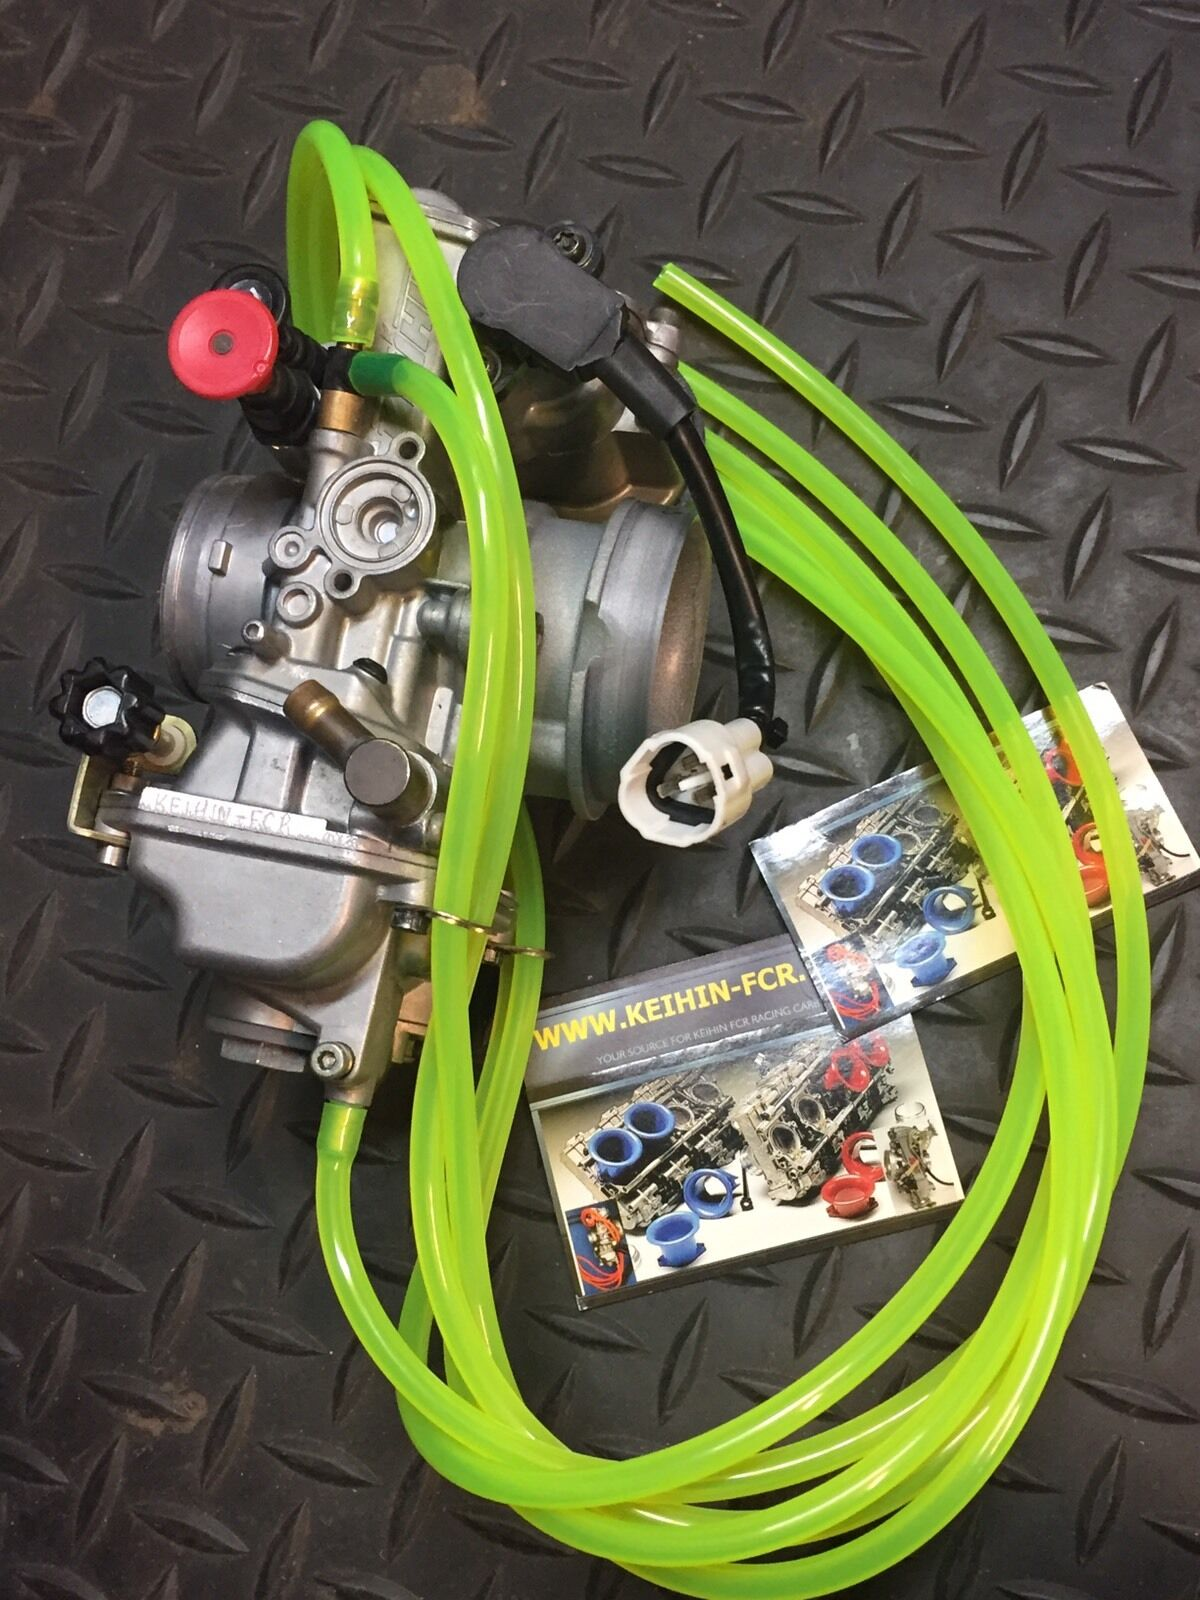 Honda CRF 450 450R Neon Yellow Carburetor Vent Line / CRF450 CRF450R  CRF450X   Shopping Bin - Search eBay faster